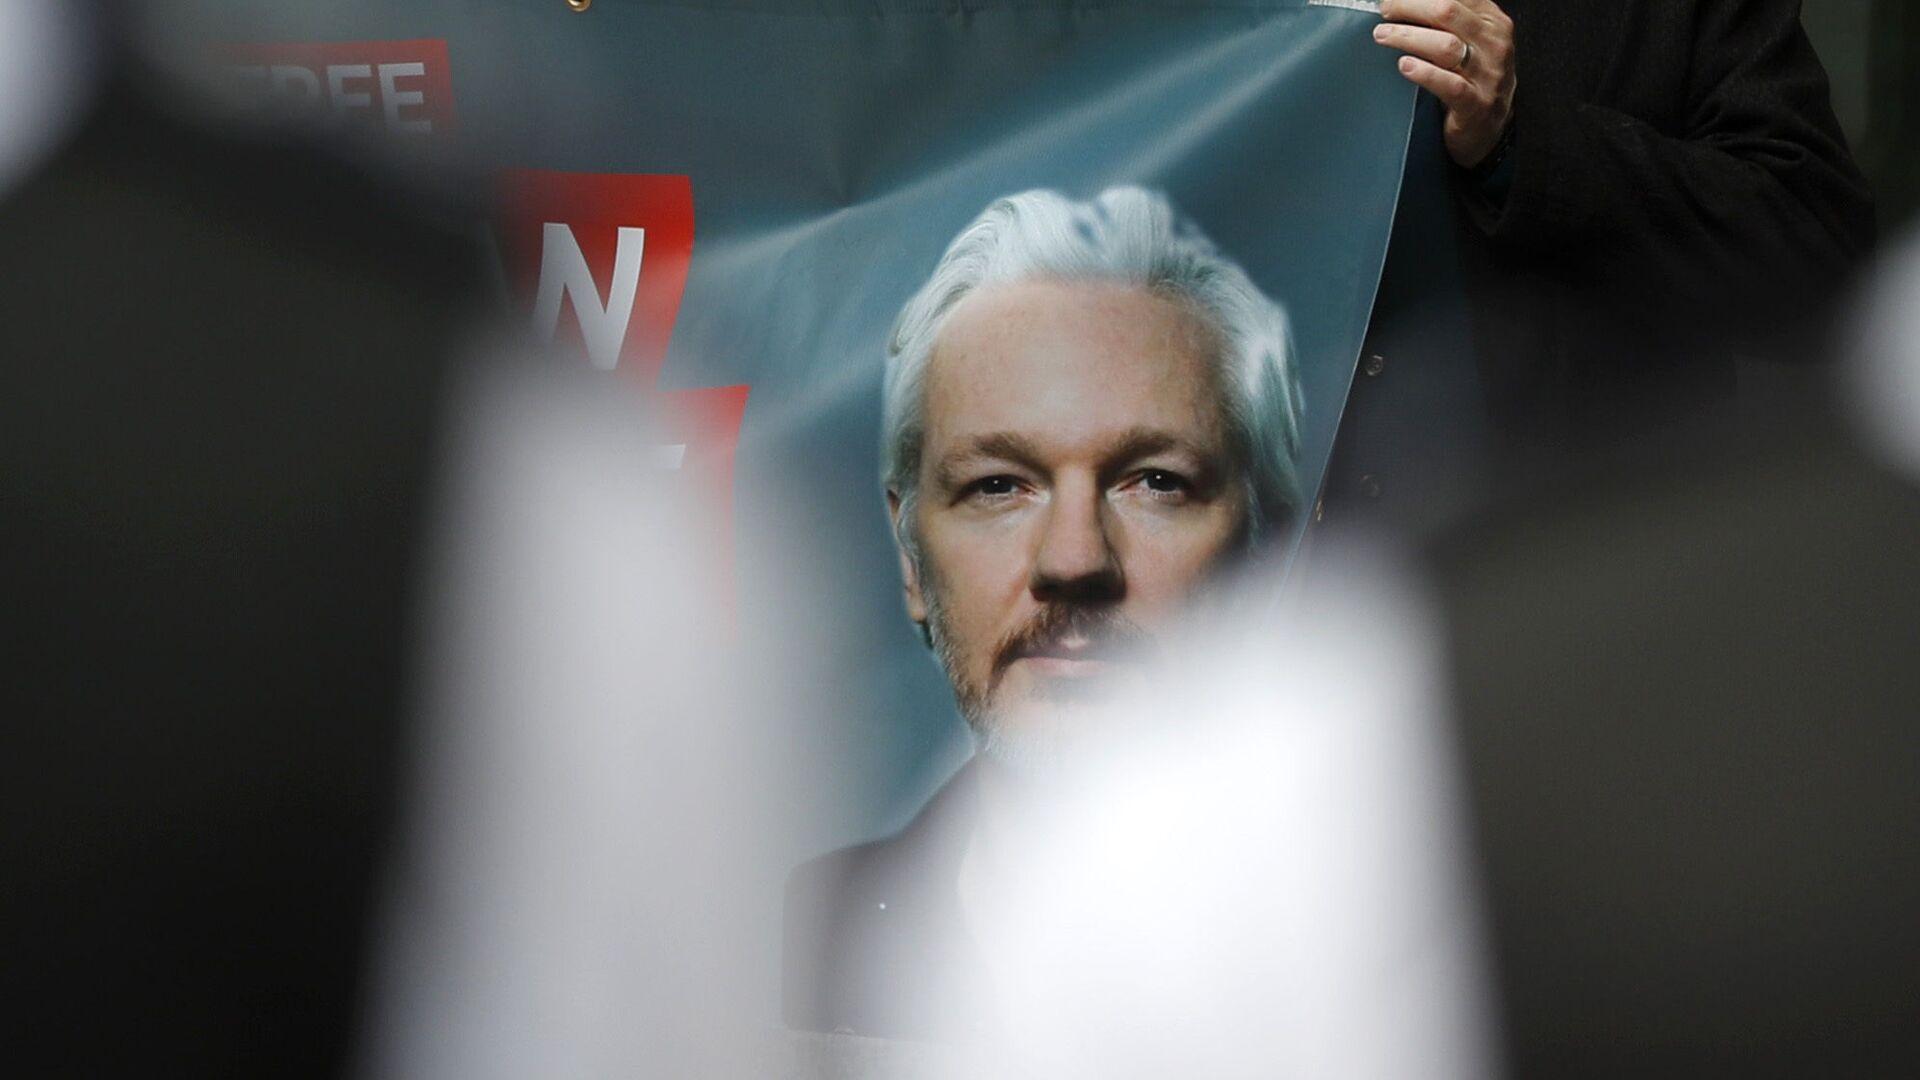 Retrato de Julian Assange, fundador de Wikileaks - Sputnik Mundo, 1920, 07.07.2021